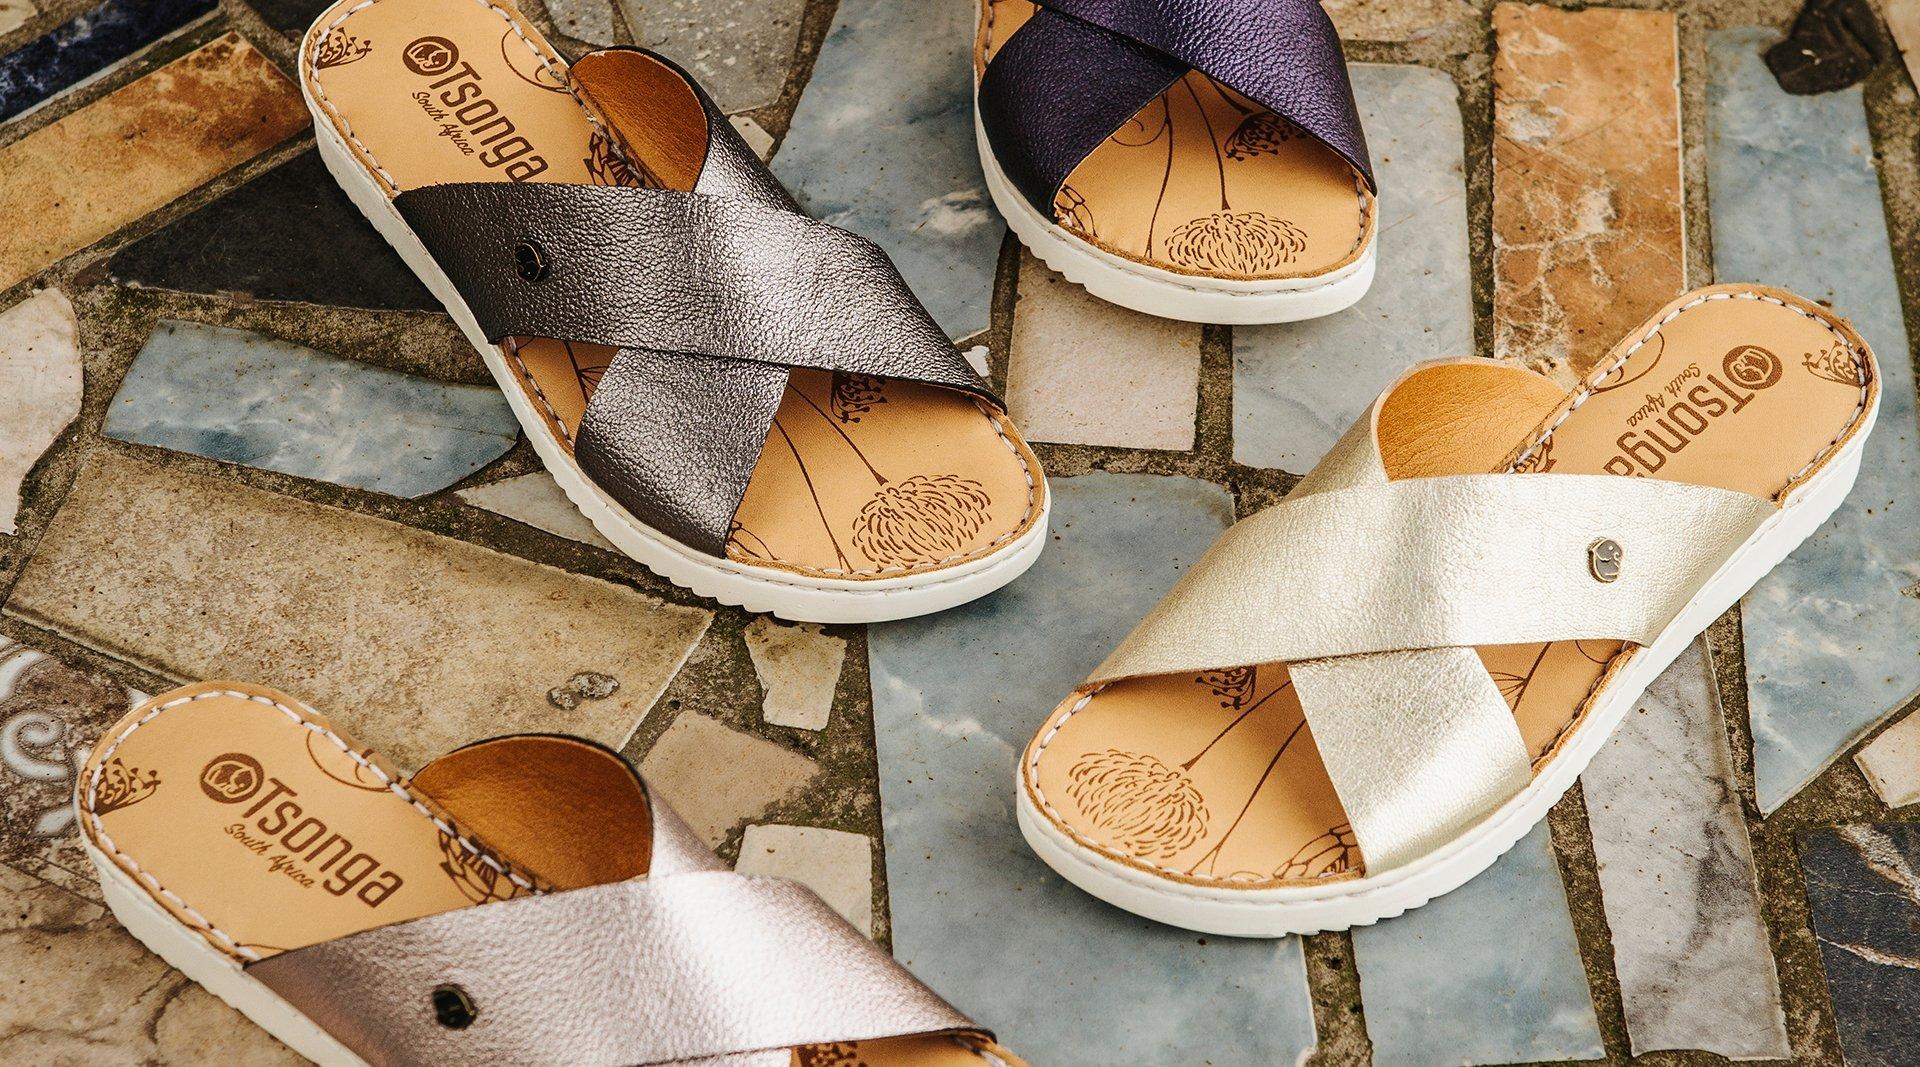 ec695258 Tsonga Shoes & Bags - The Midlands Meander KwaZulu-Natal